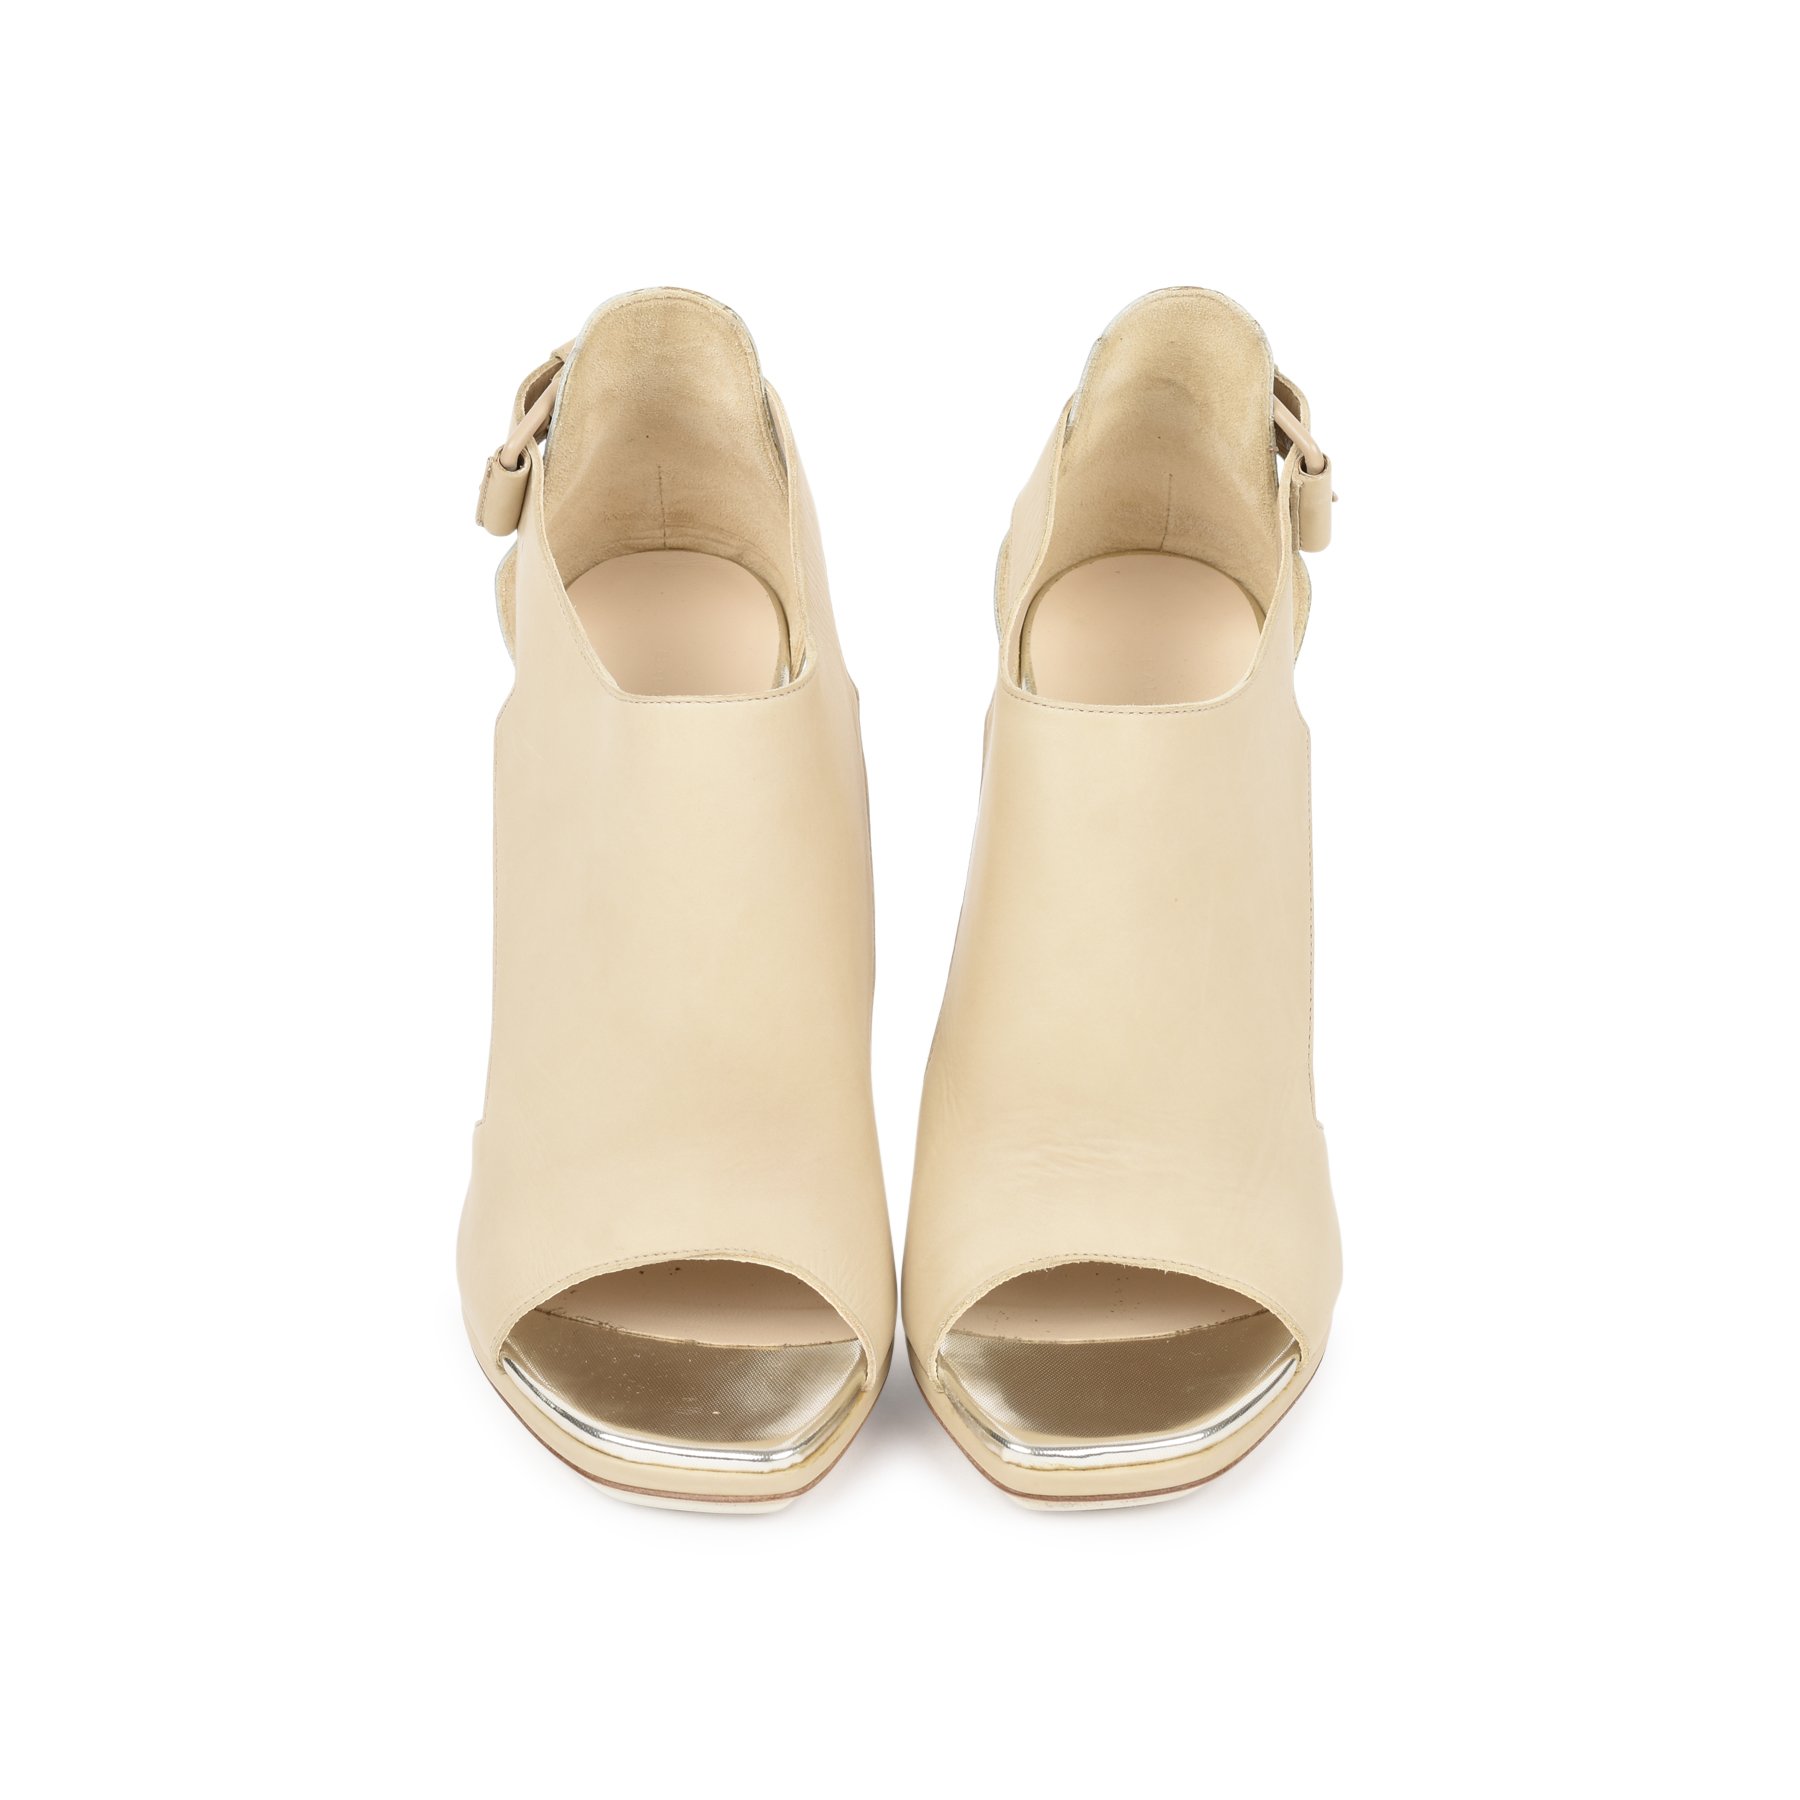 442ae6ebc17 Authentic Second Hand Balenciaga Geometric Sandals (PSS-513-00026 ...